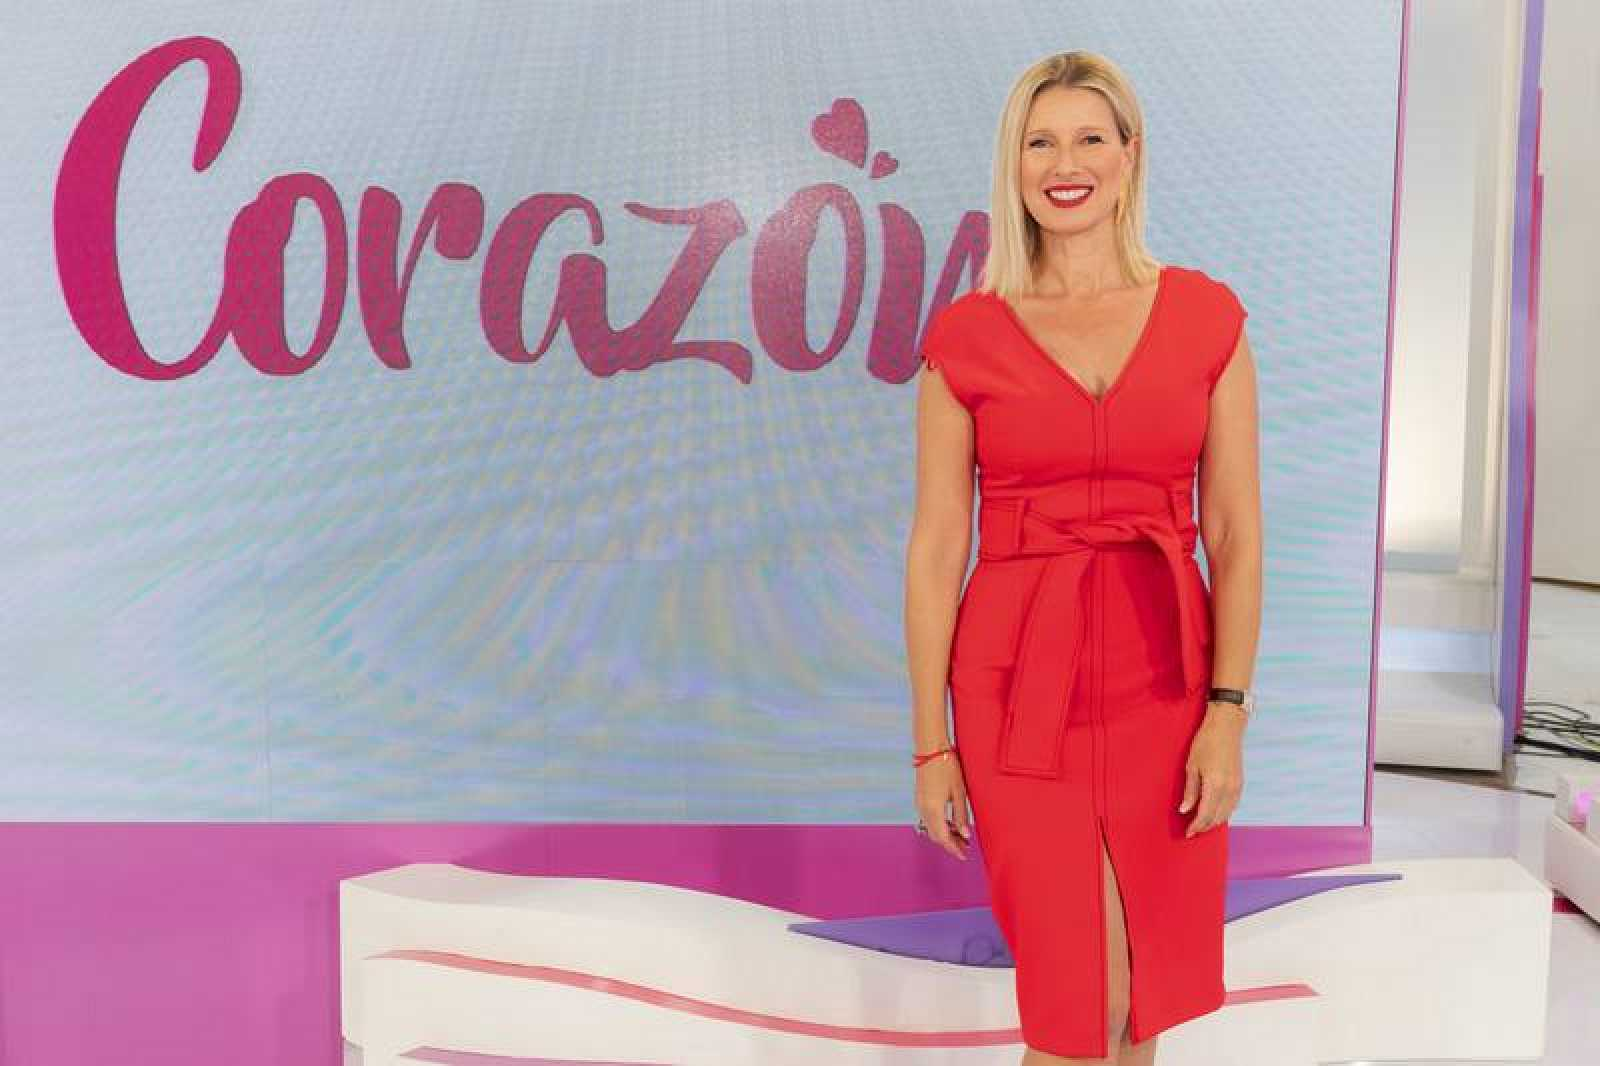 Anne Igartiburu, presentadora de 'Corazón'